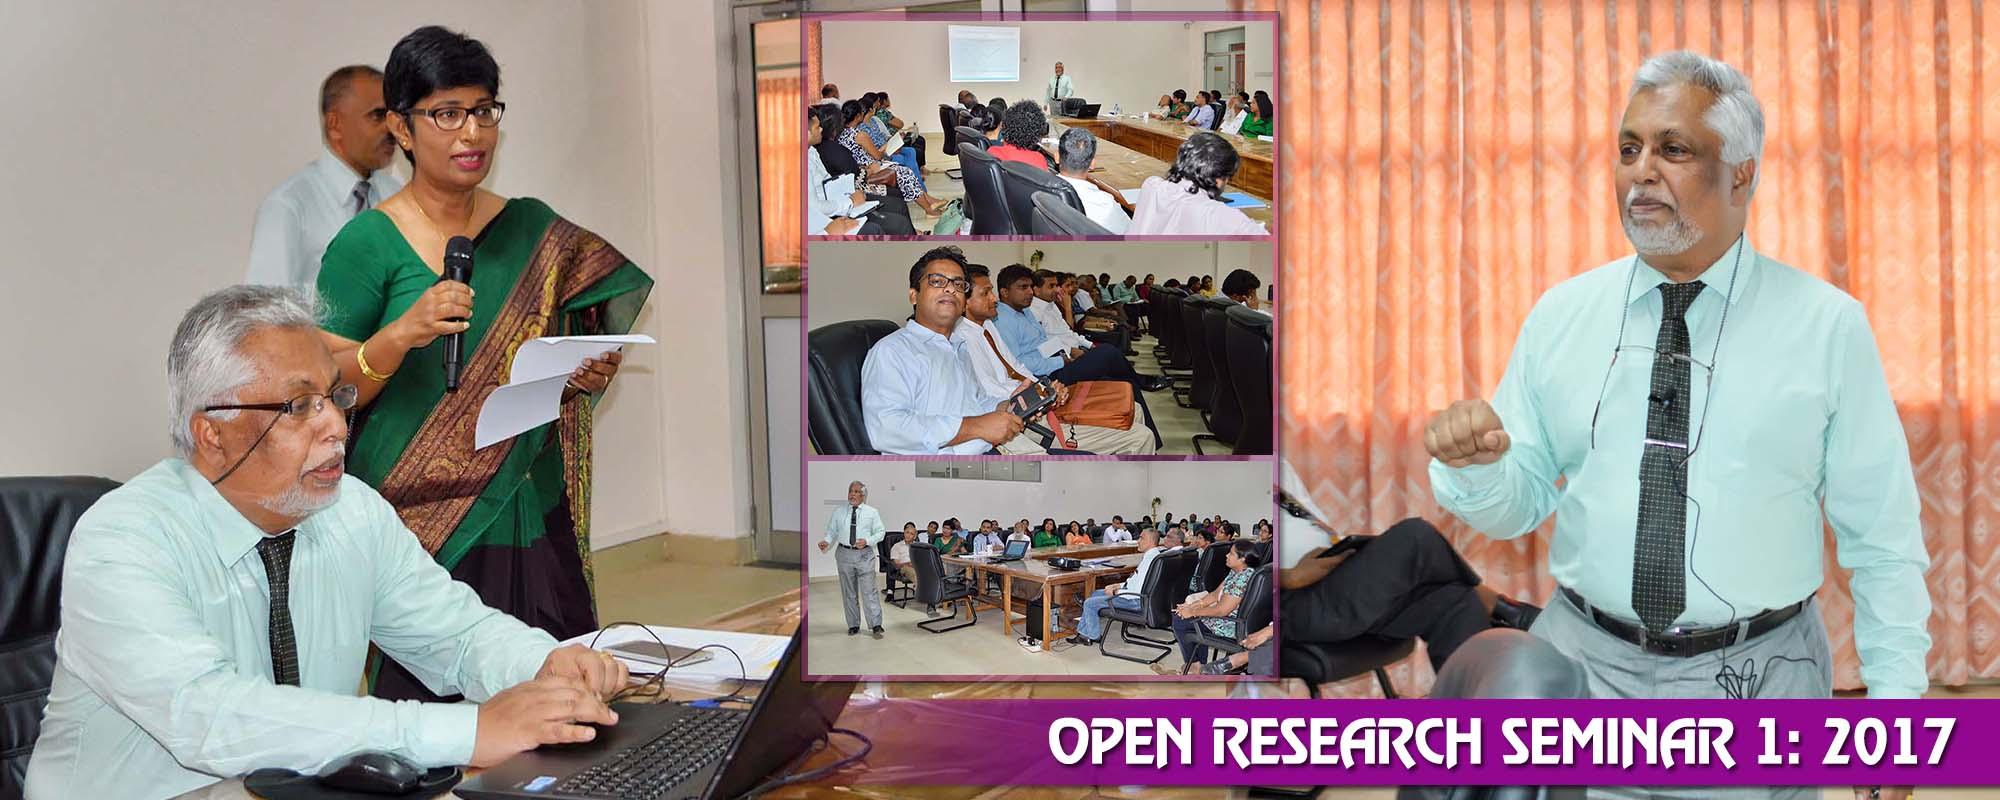 Open Research Seminar